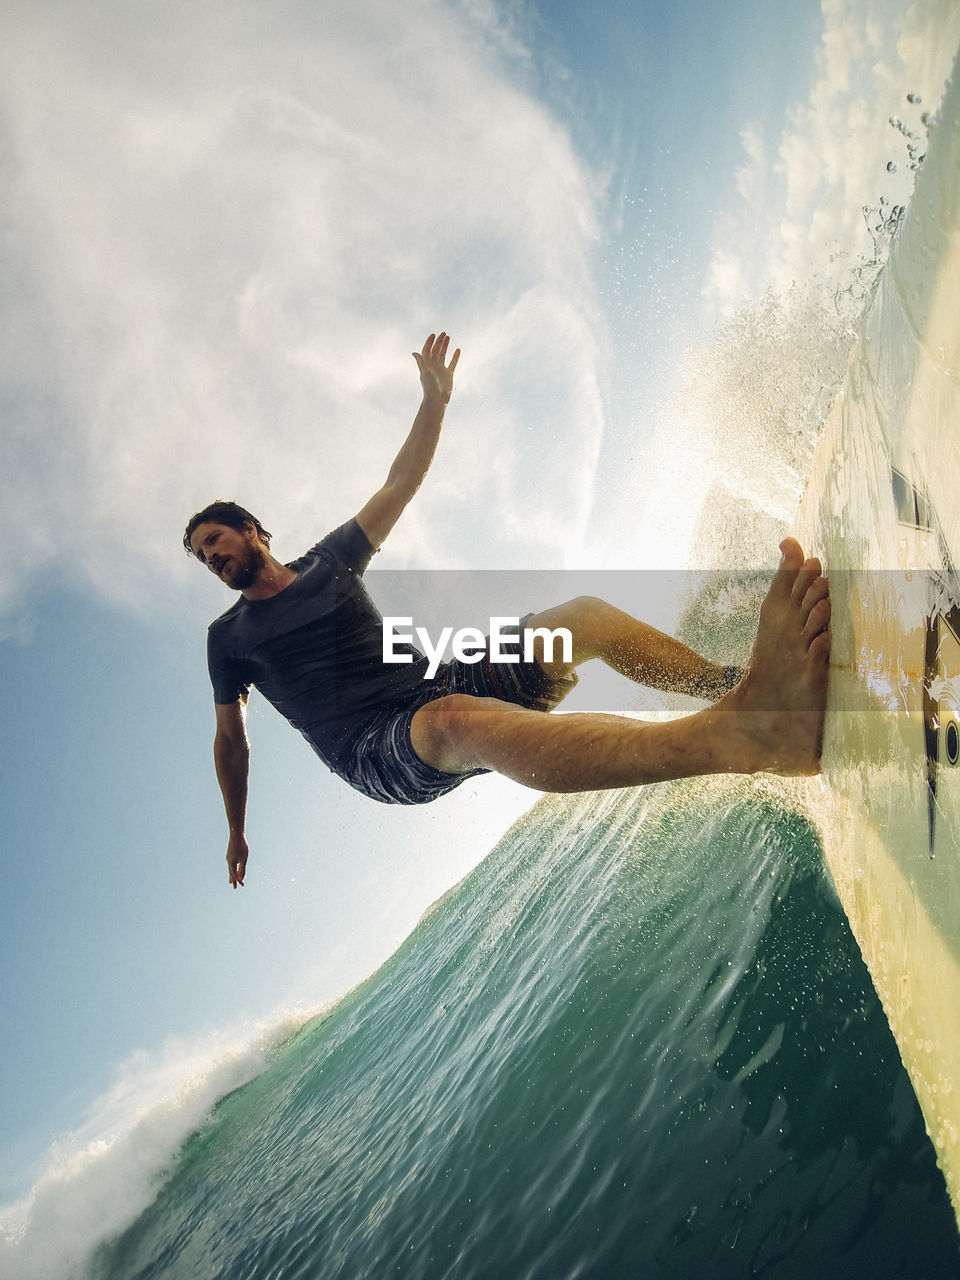 Tilt Image Of Man Surfing On Sea Against Sky